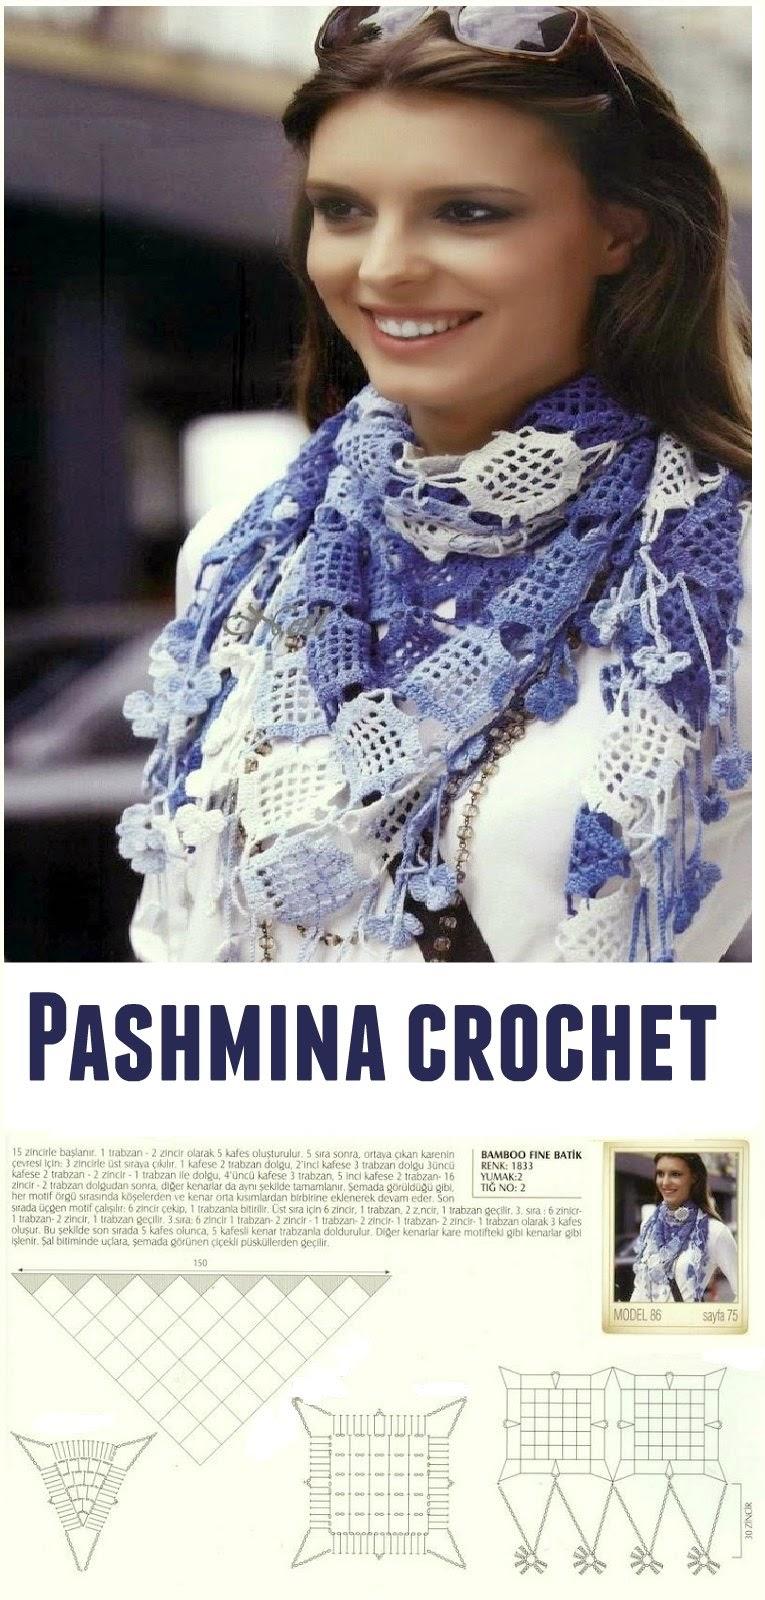 Pashmina crochet gama colores